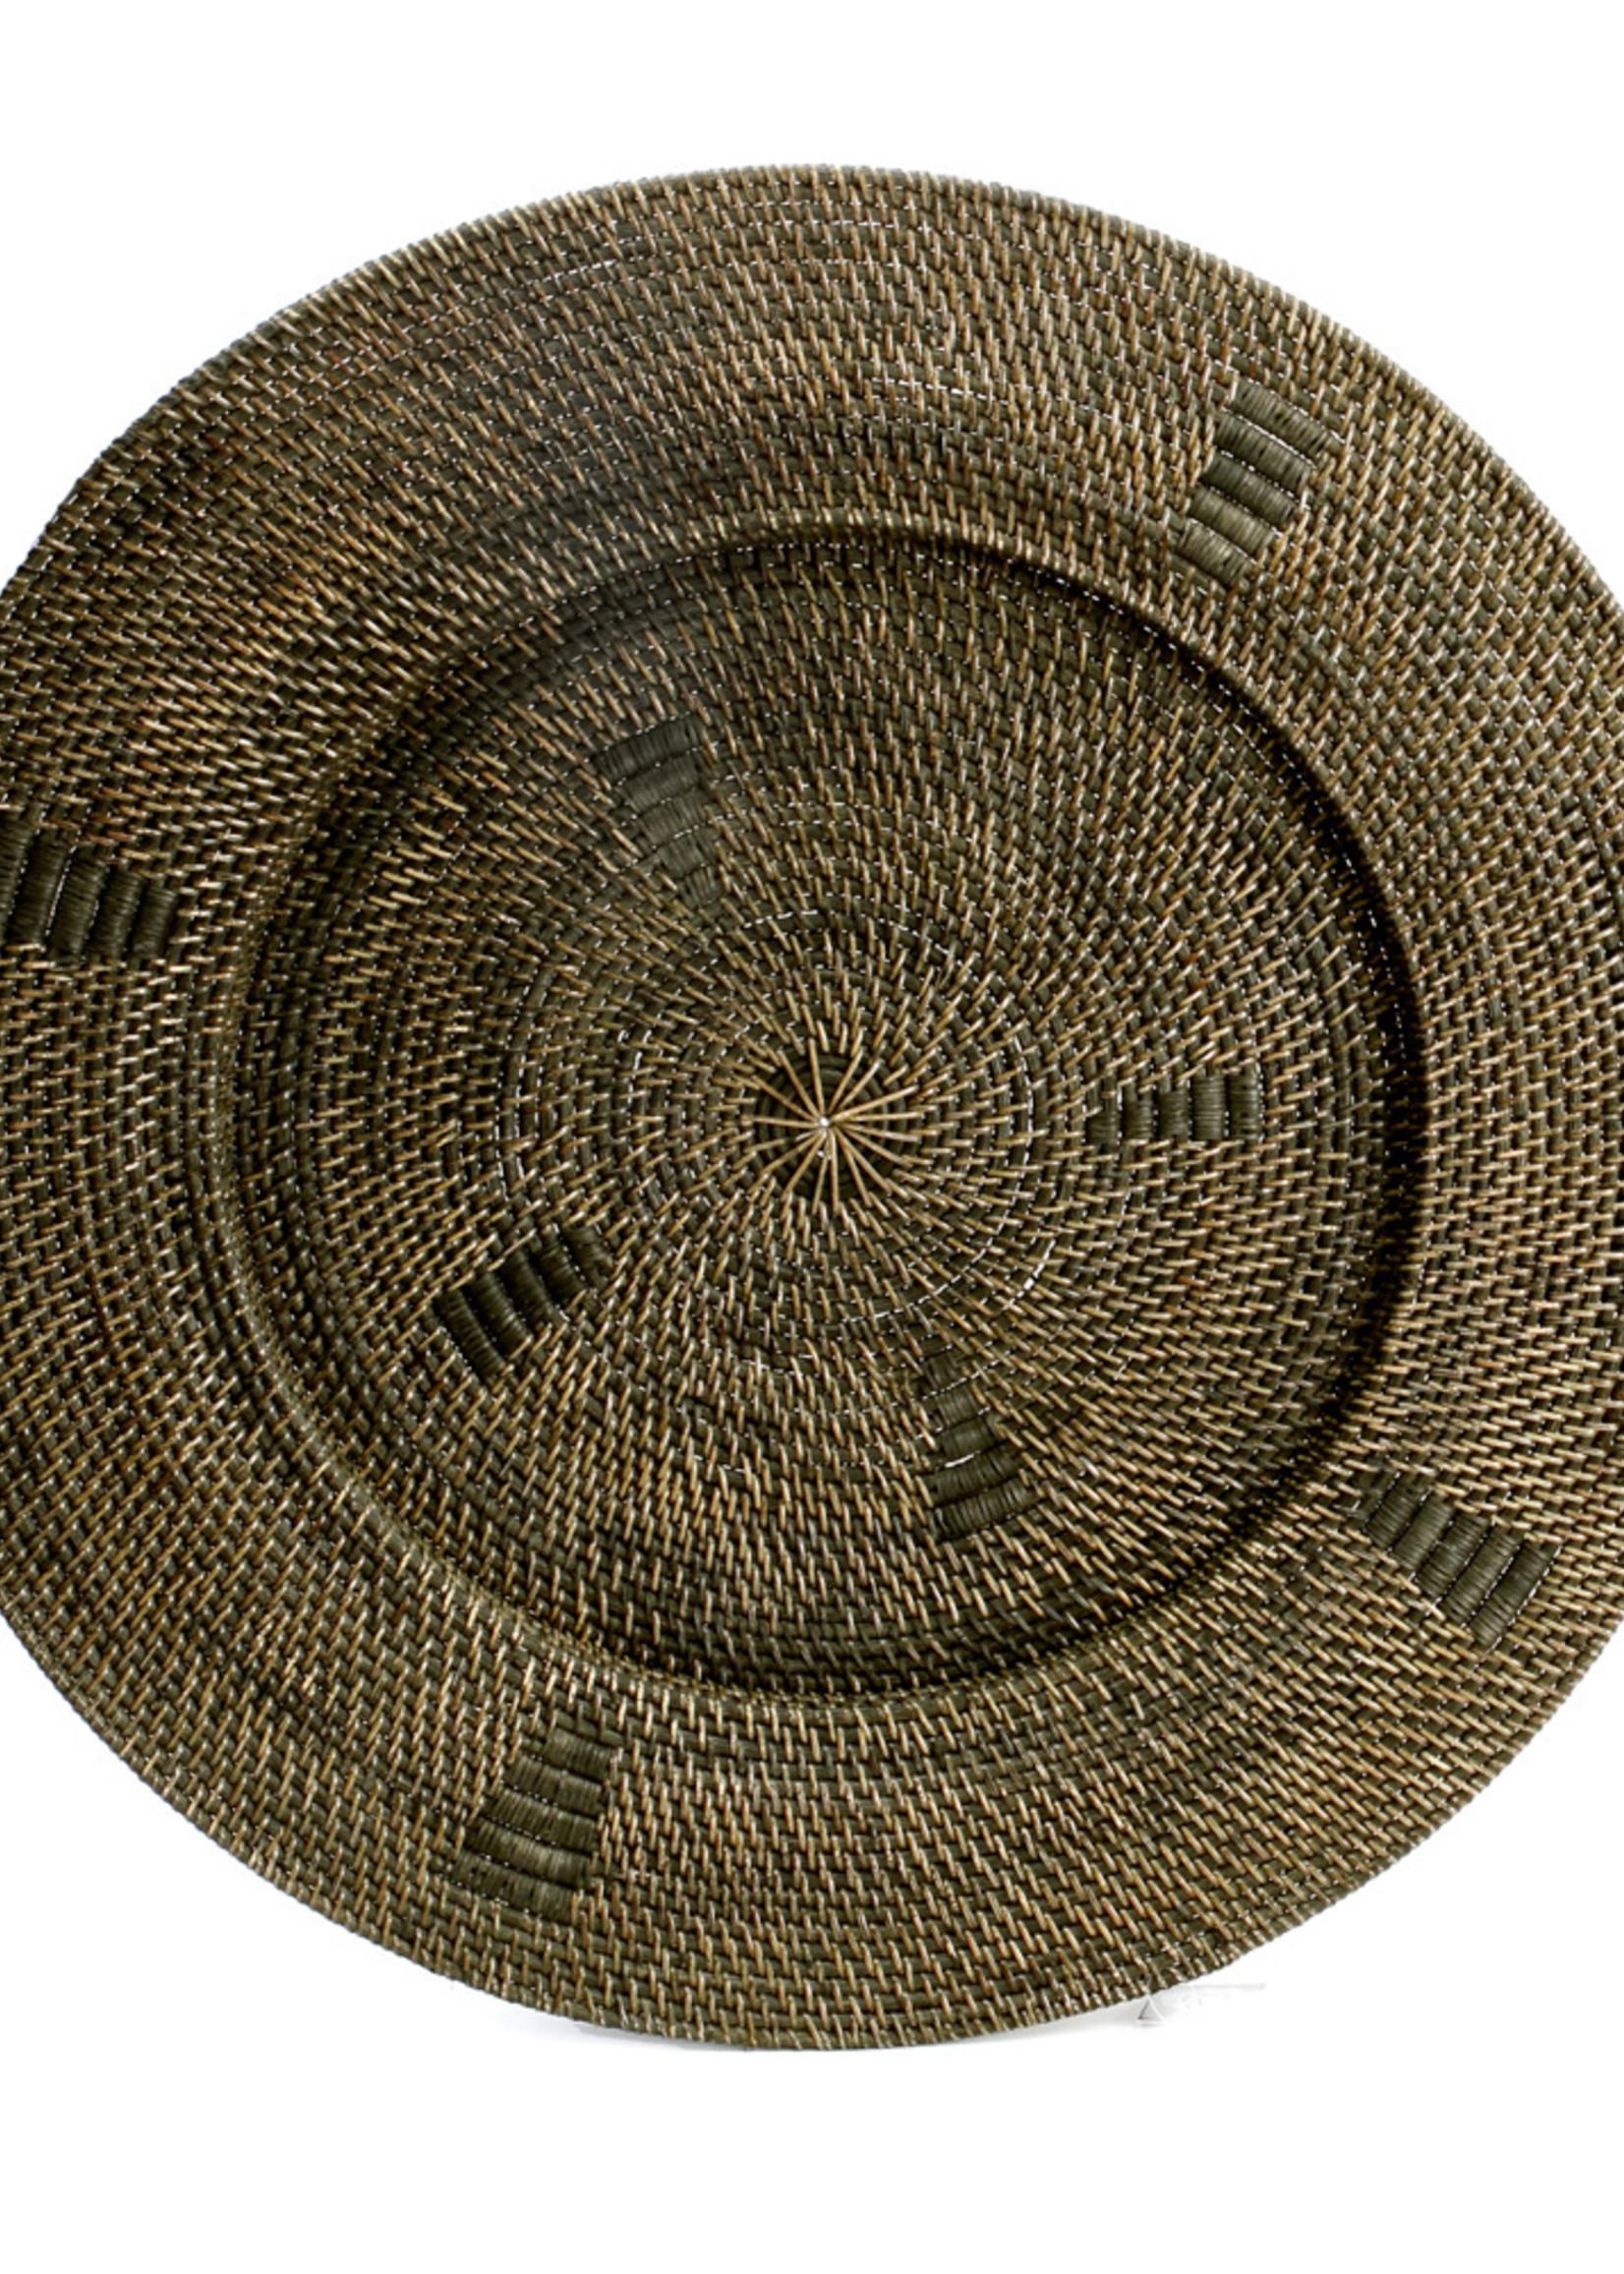 The Jasmine Plate - Brown - L